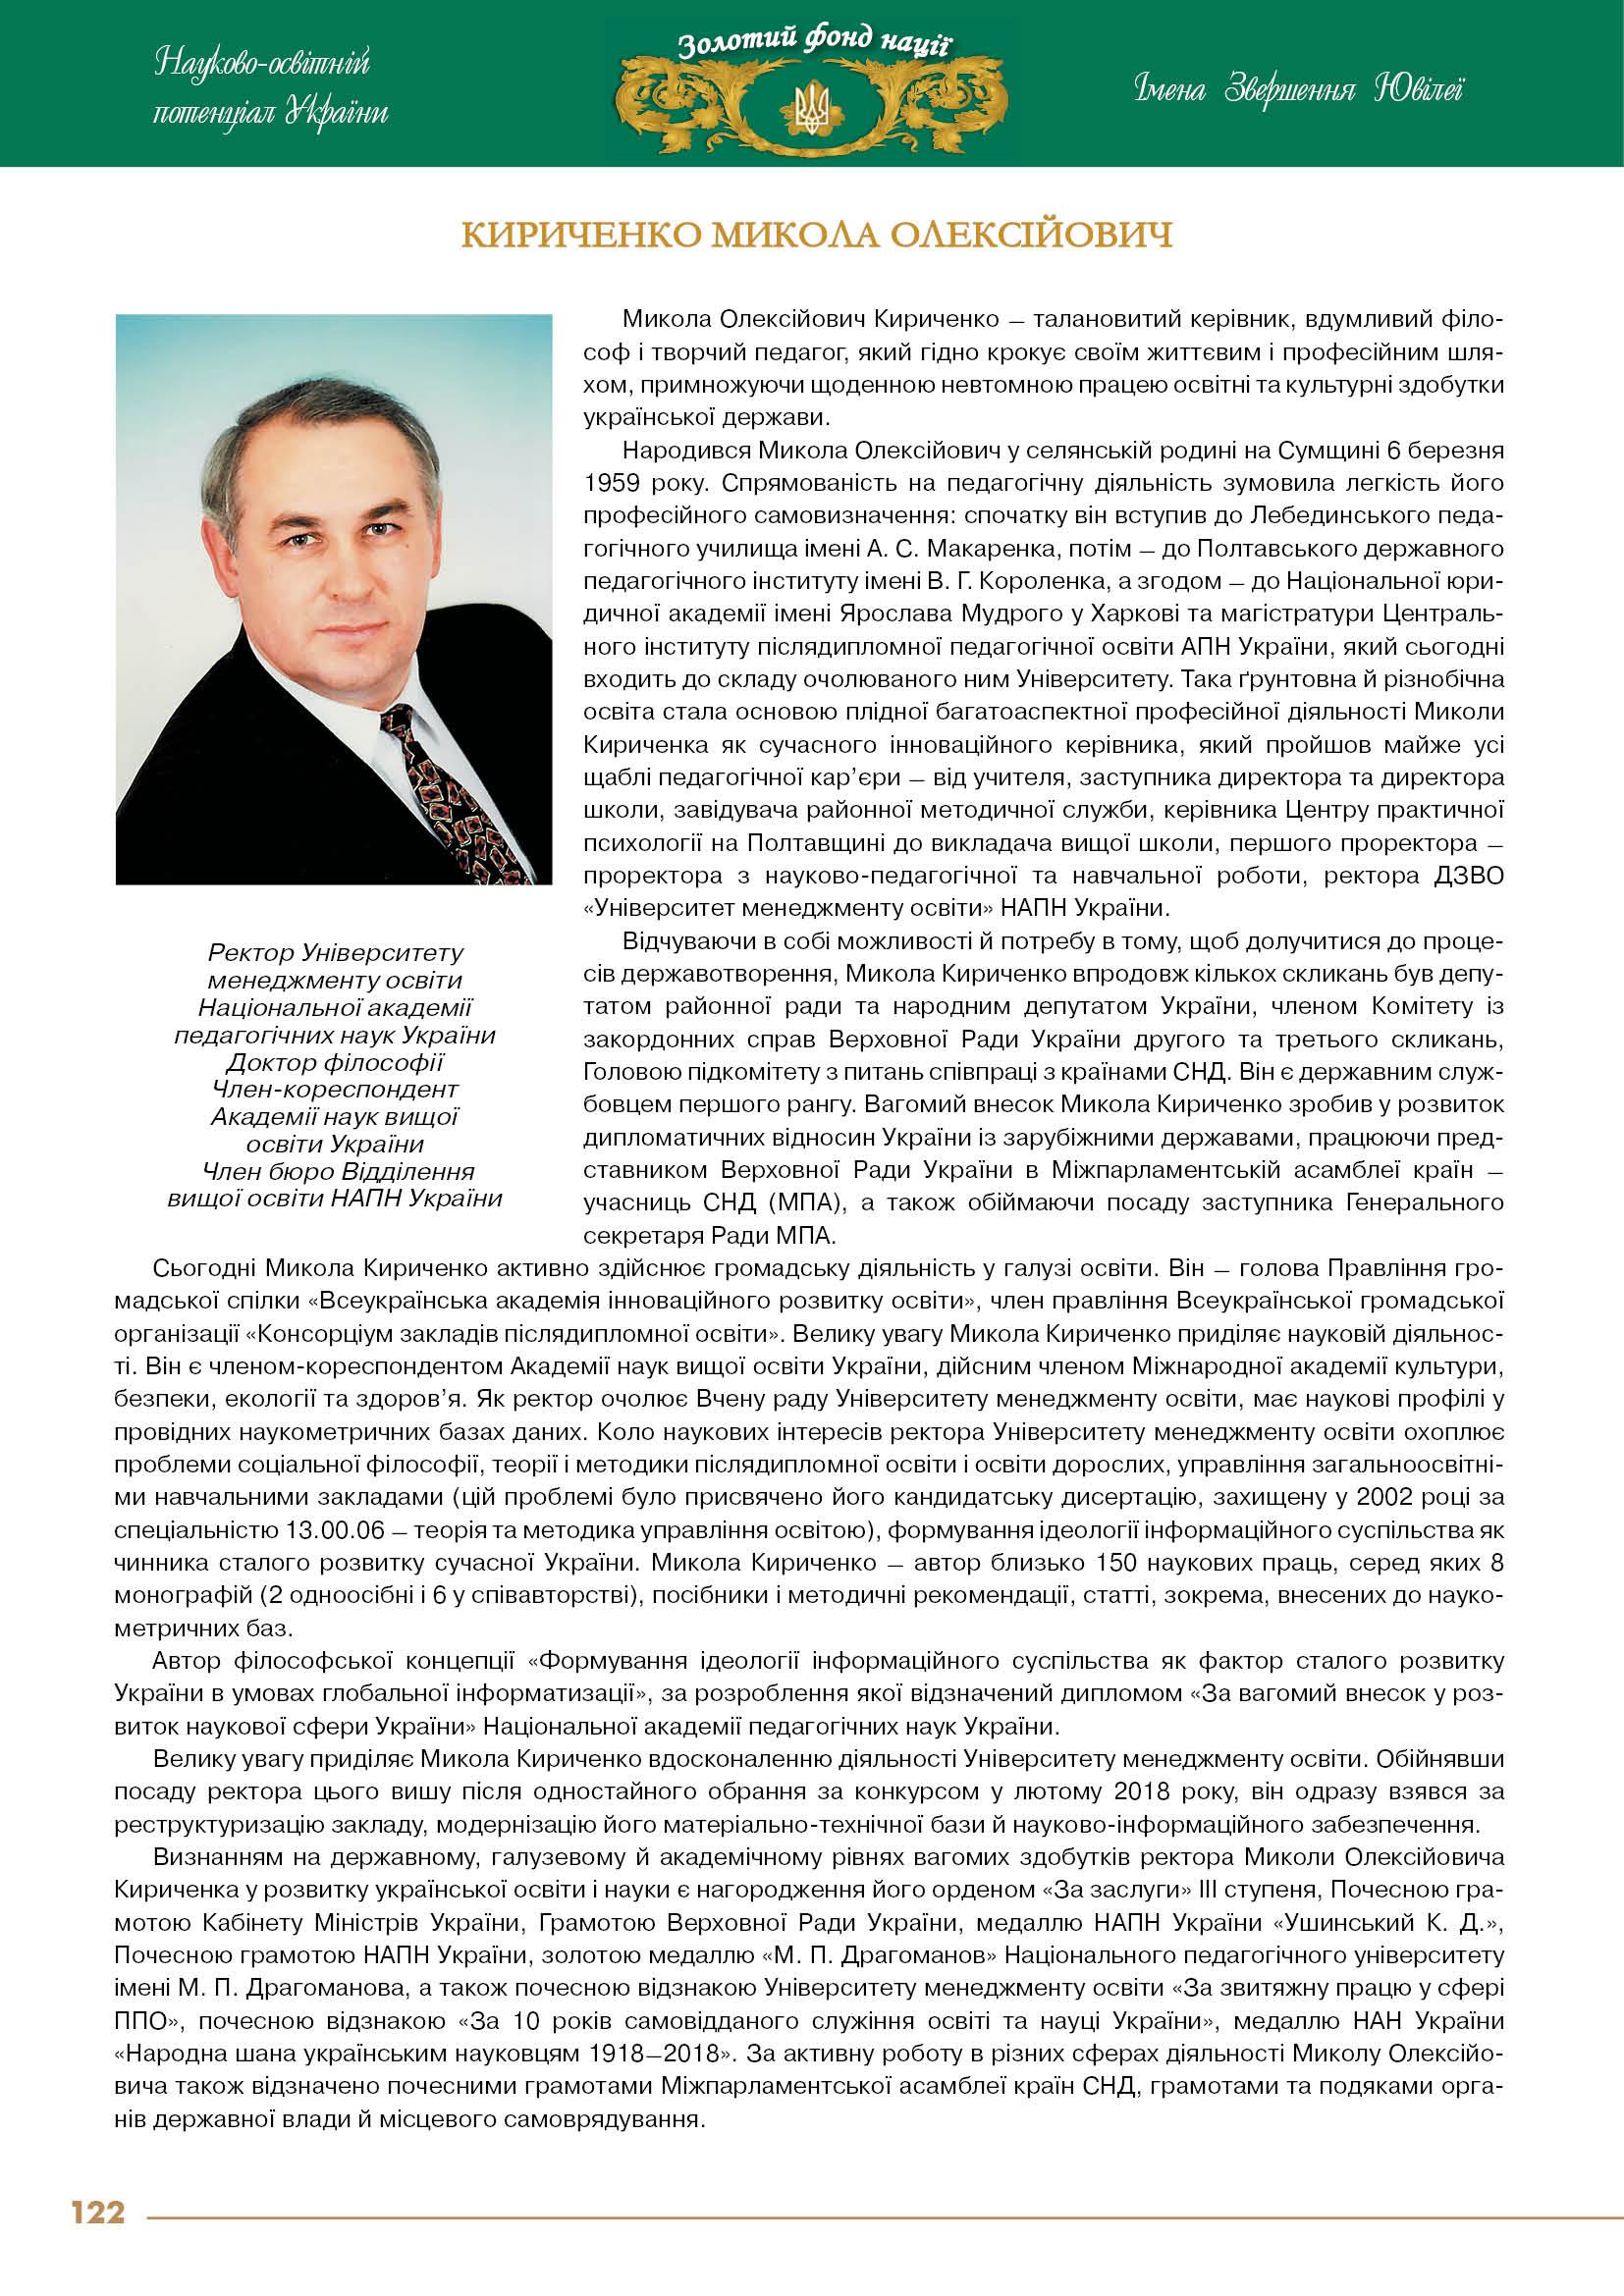 Кириченко Микола Олексійович